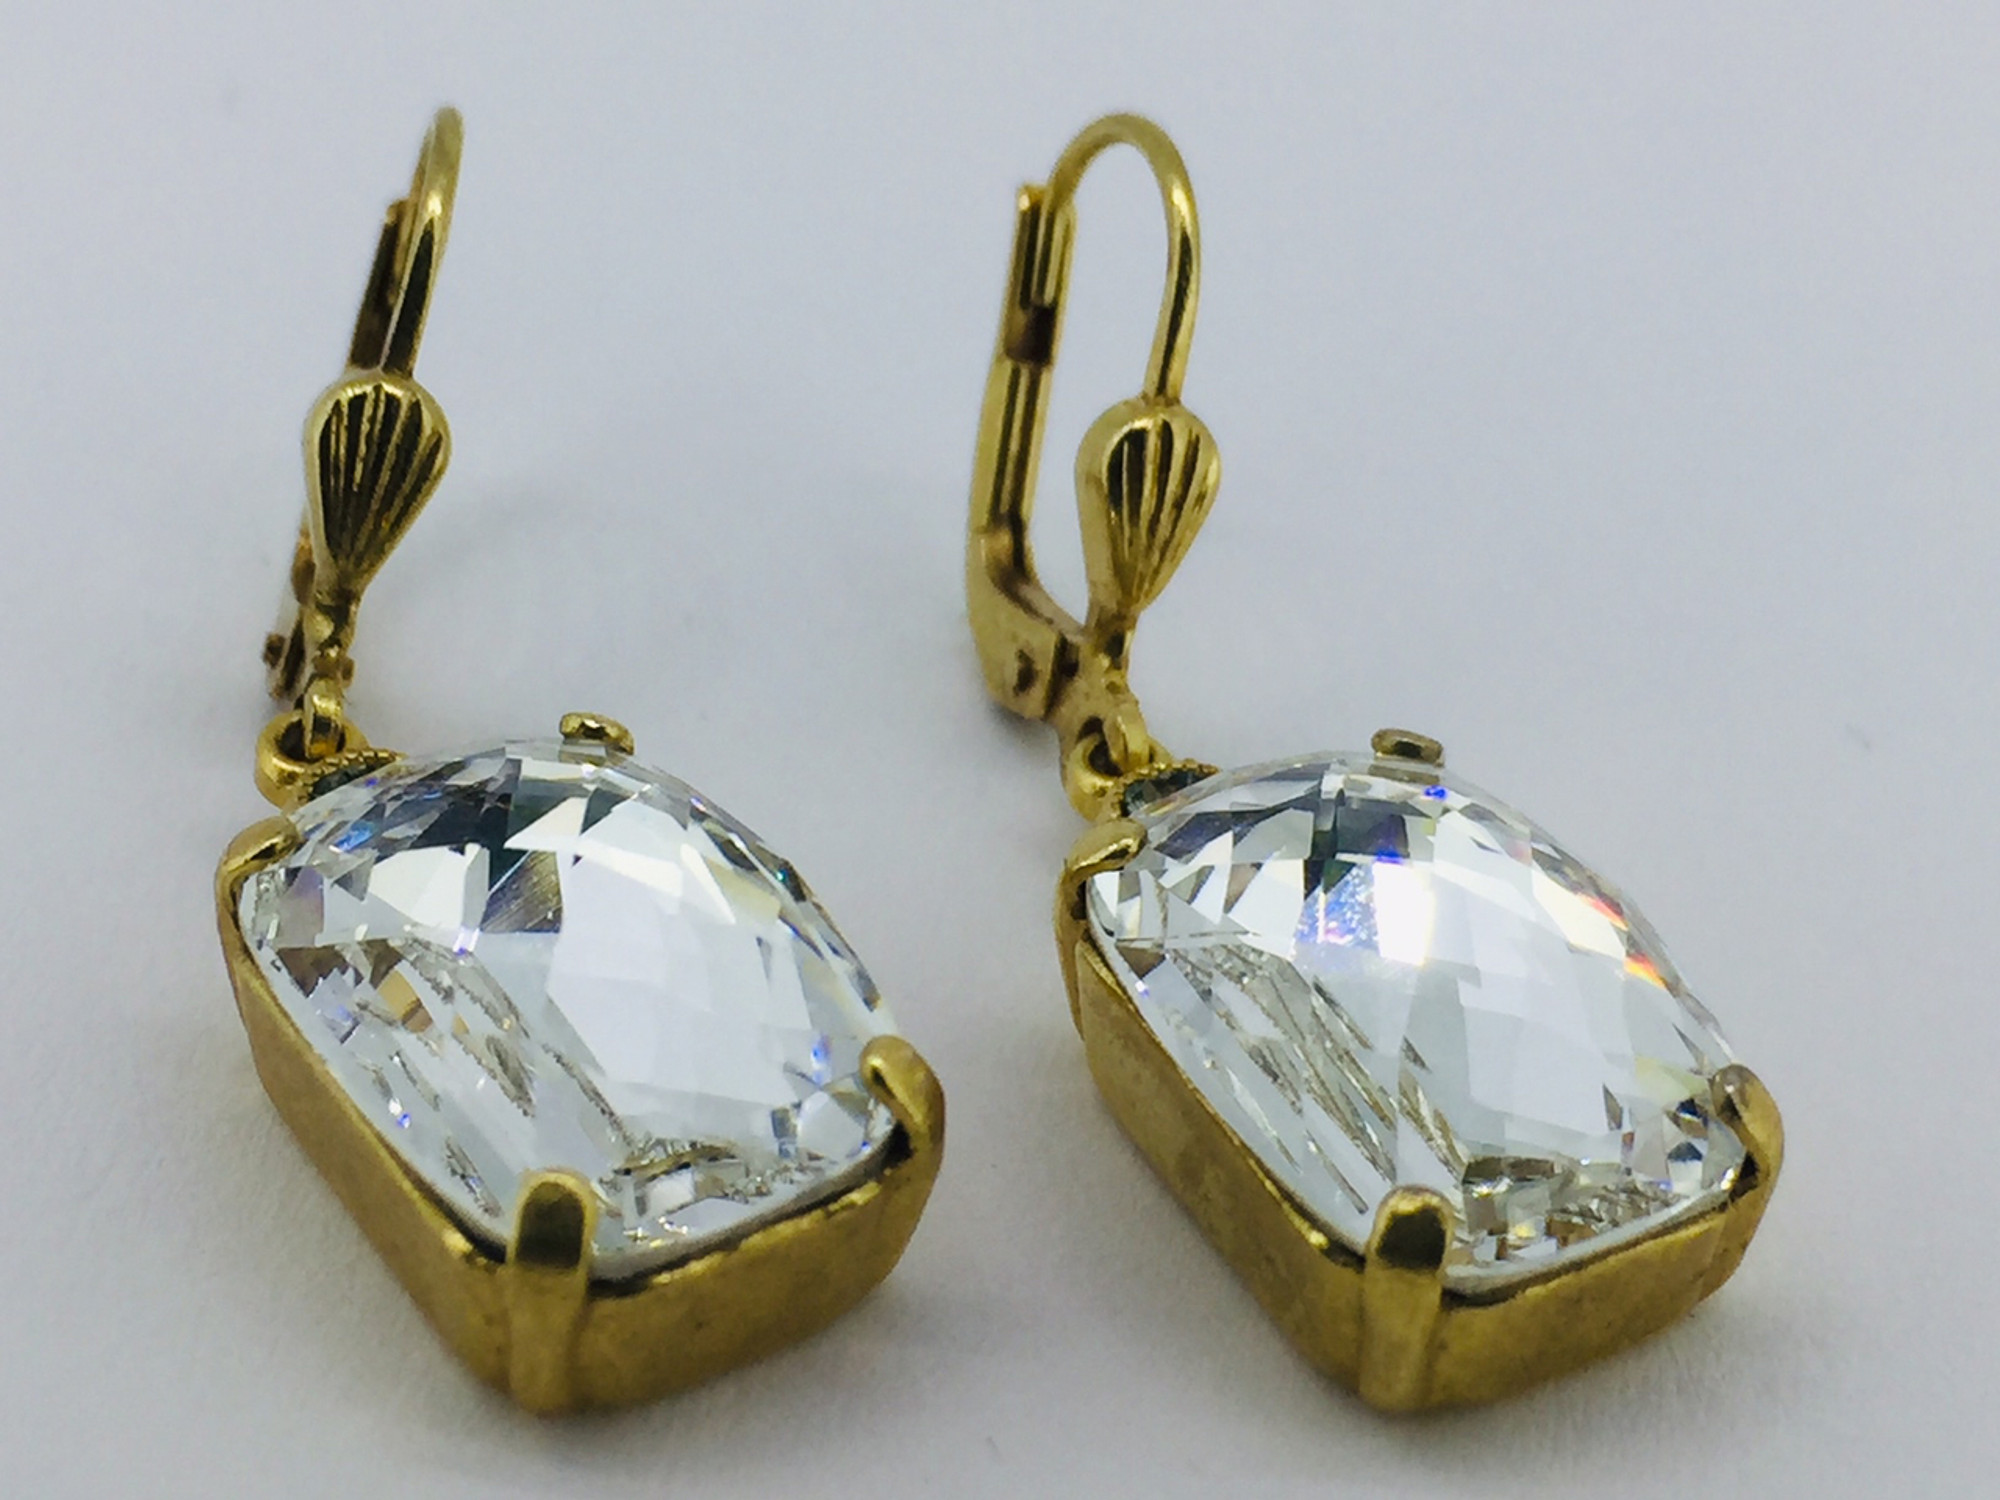 c859c84f3 Gold Rectangle Clear Swarovski Crystal Earrings Gold Rectangle Clear Swarovski  Crystal Earrings